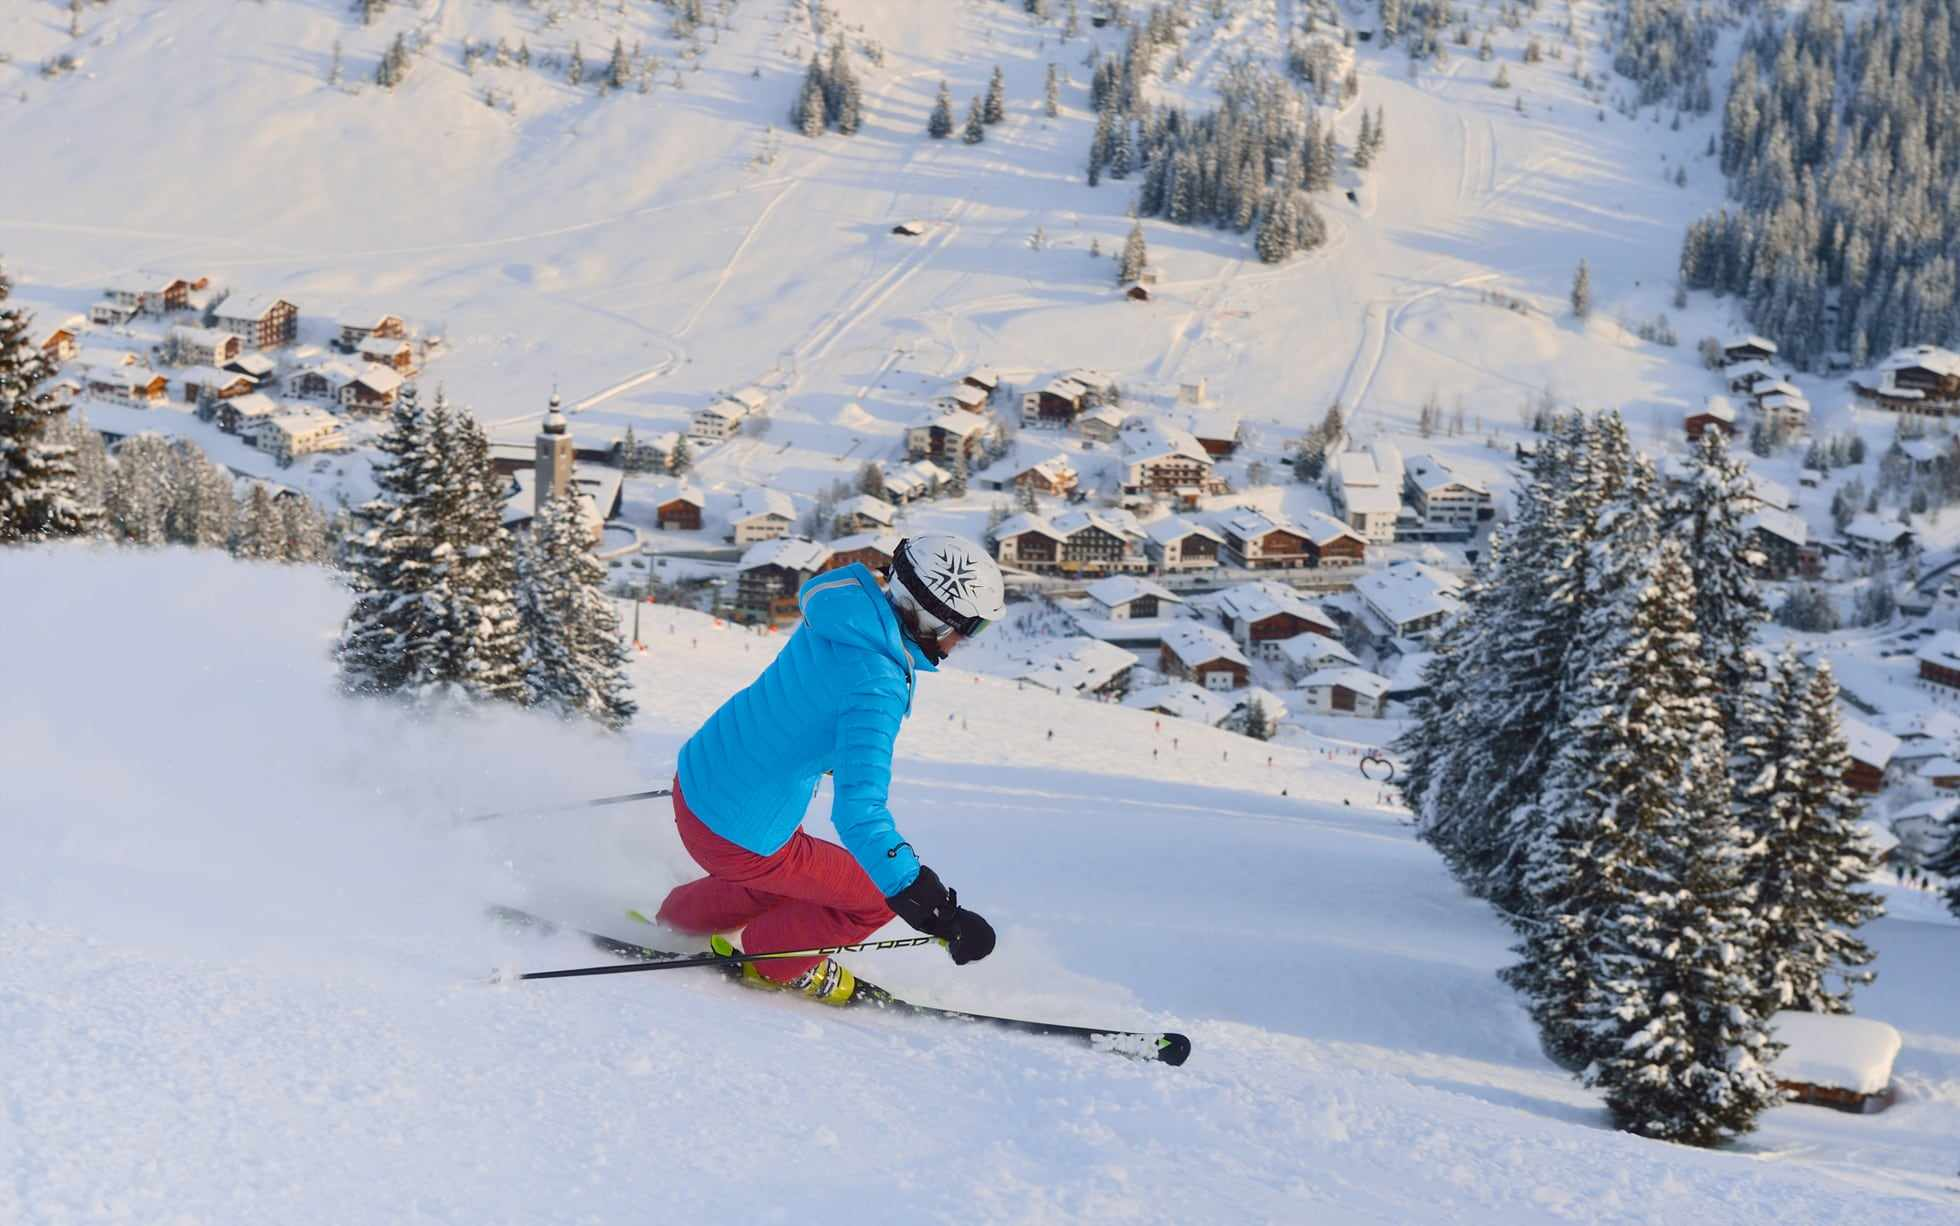 ski resorts hassle holidays built